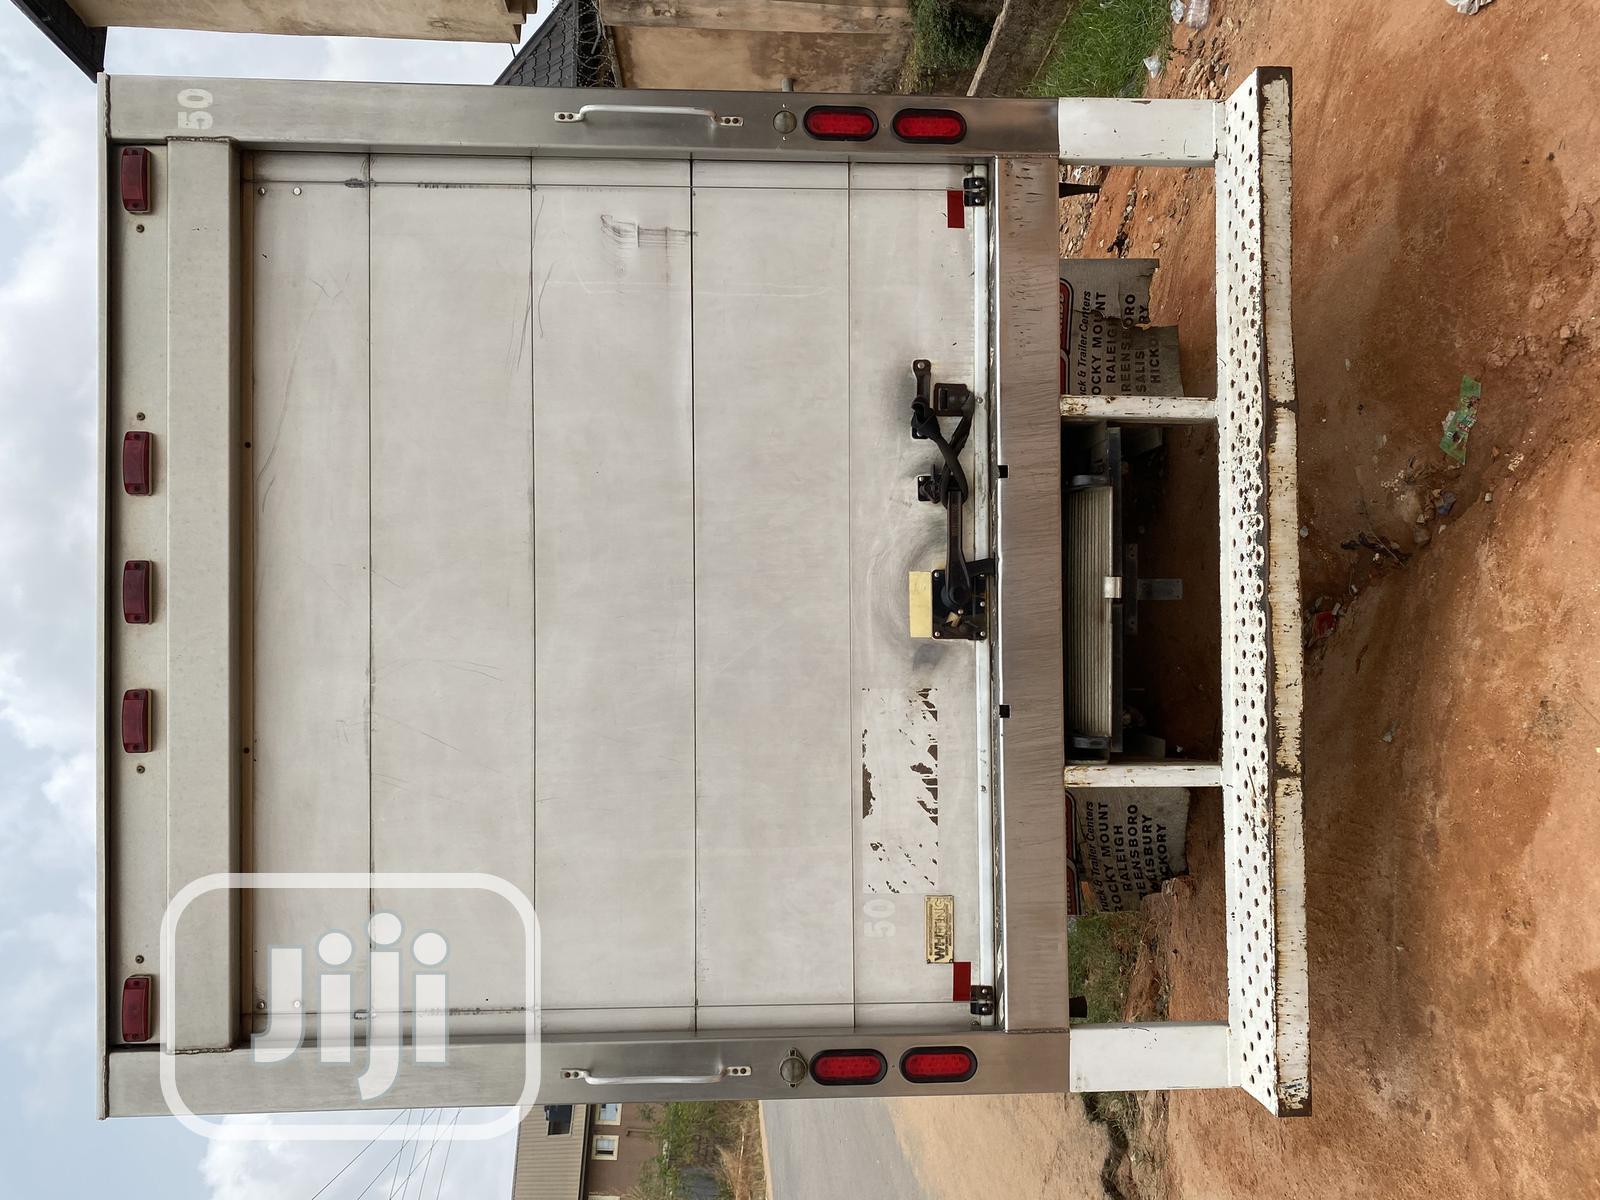 Cooling Van | Trucks & Trailers for sale in Owerri, Imo State, Nigeria